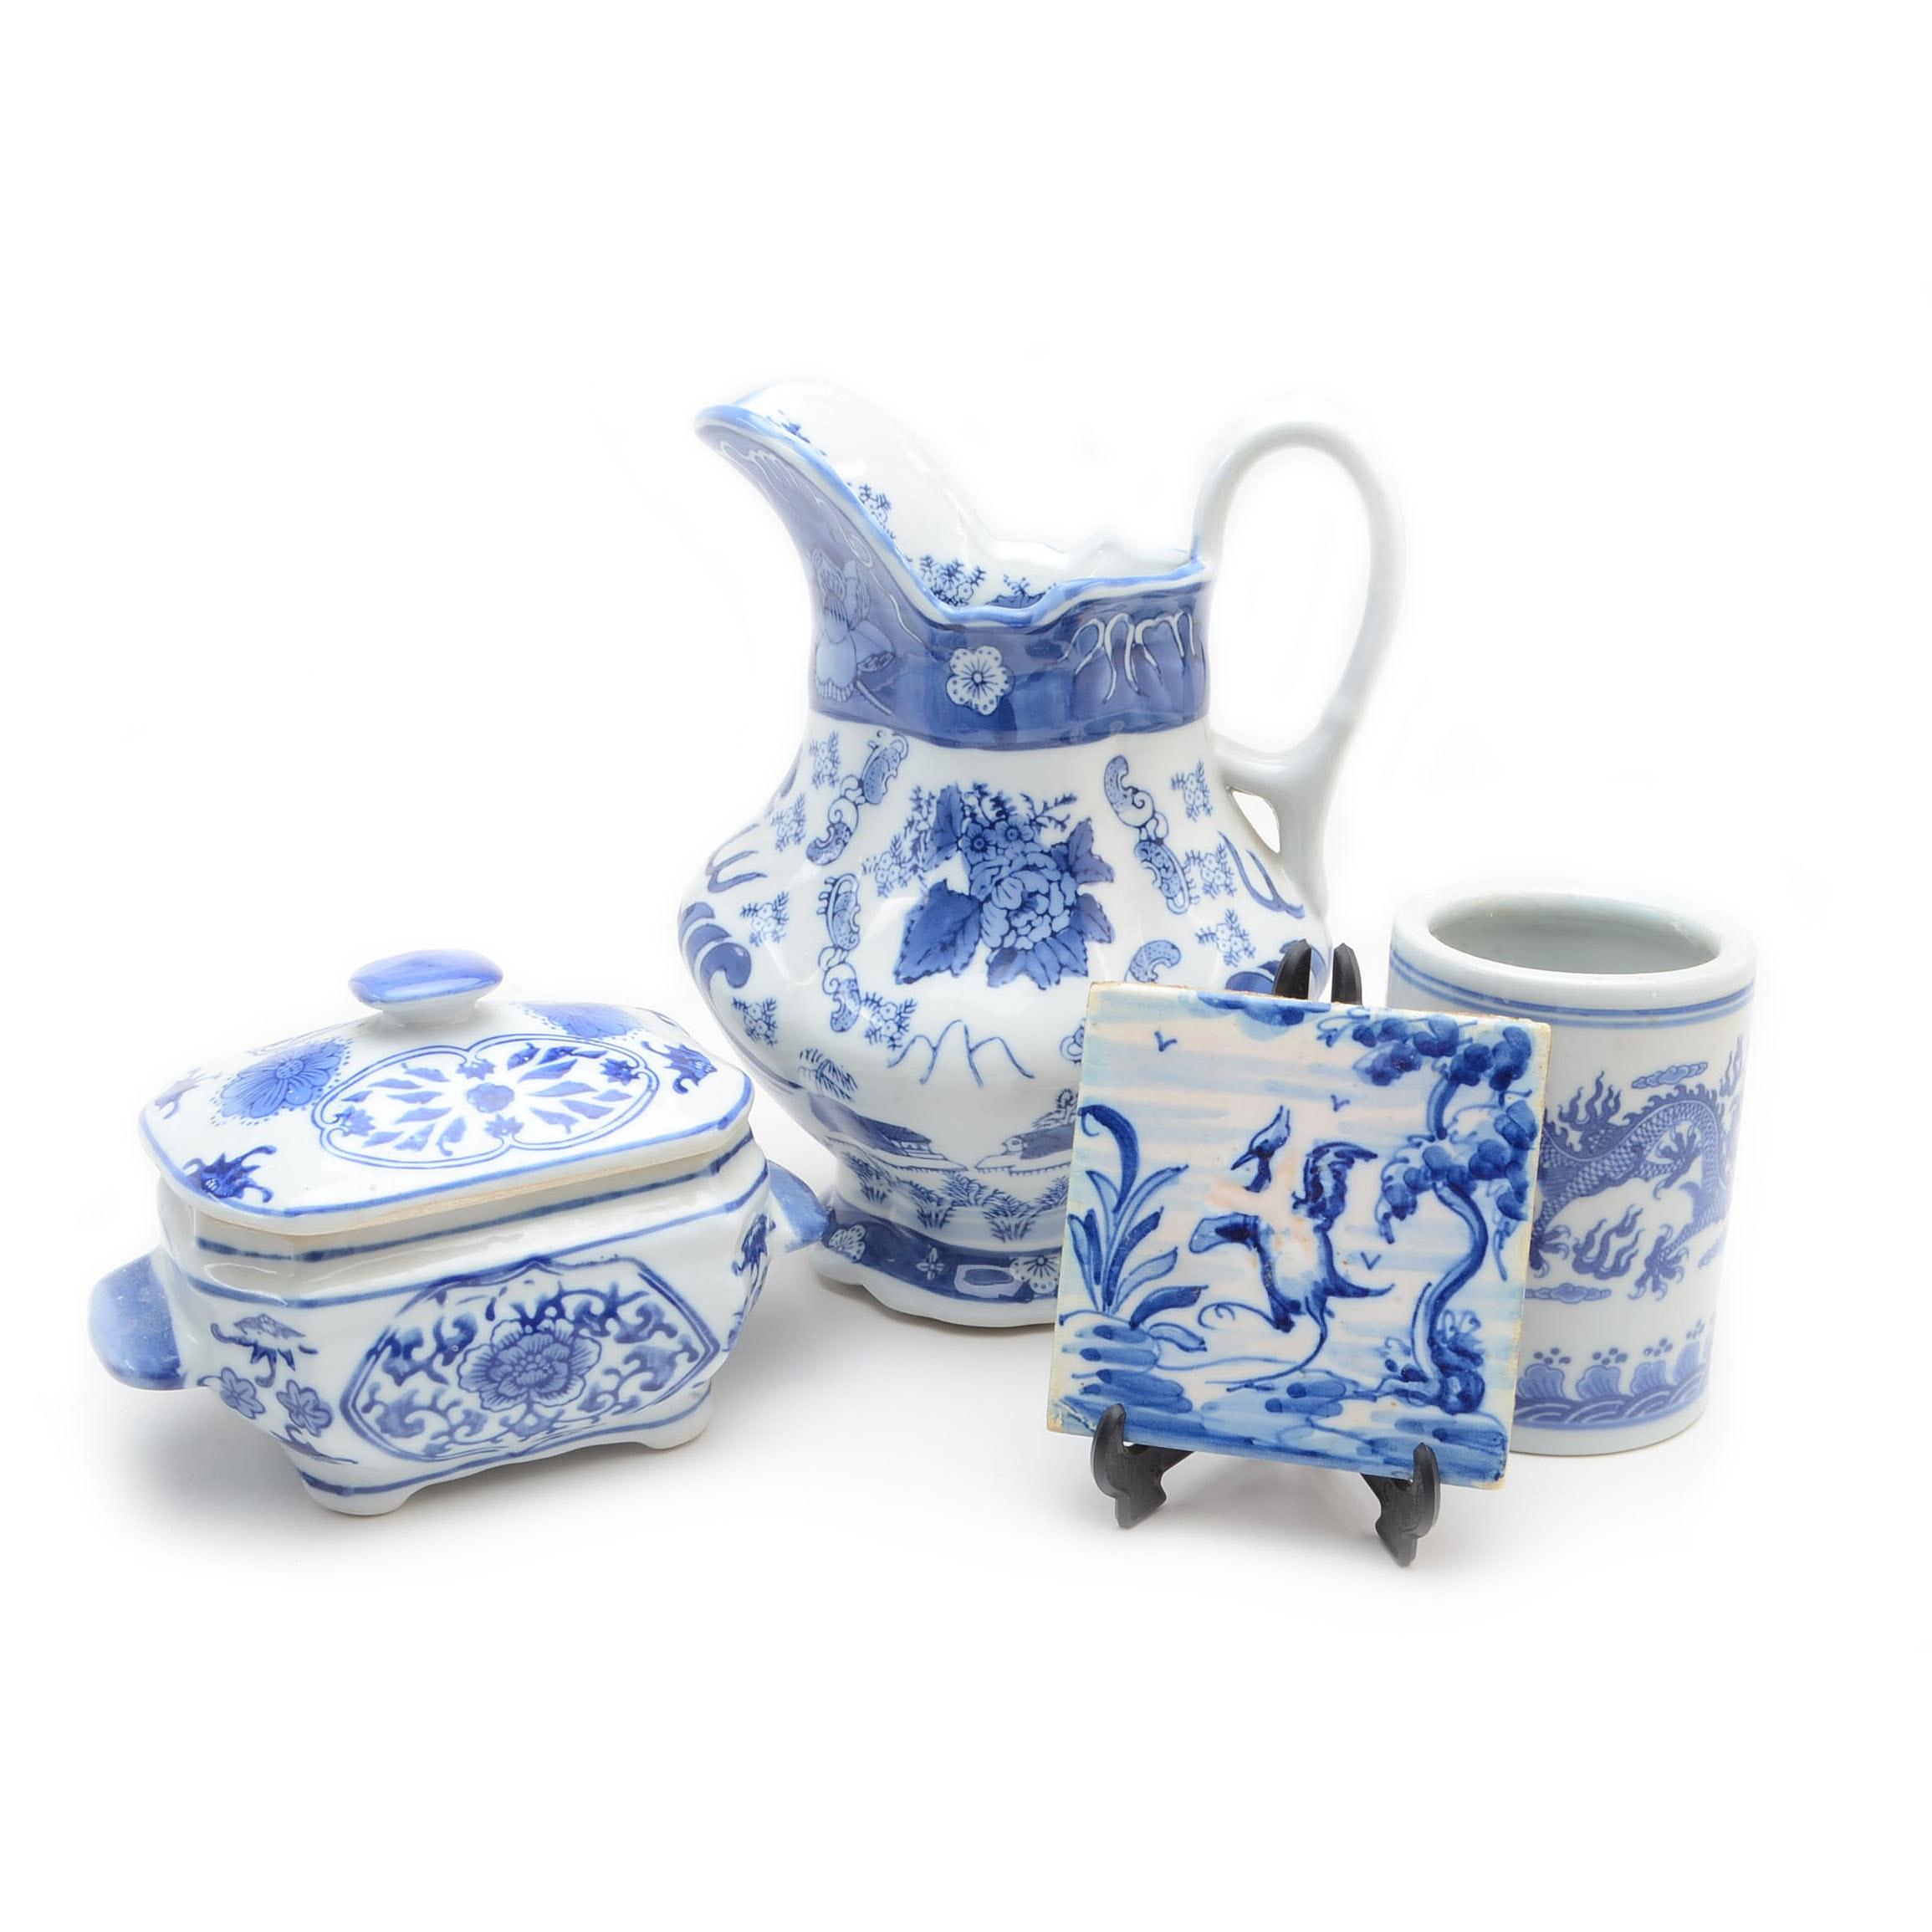 Blue and White Porcelain Decor